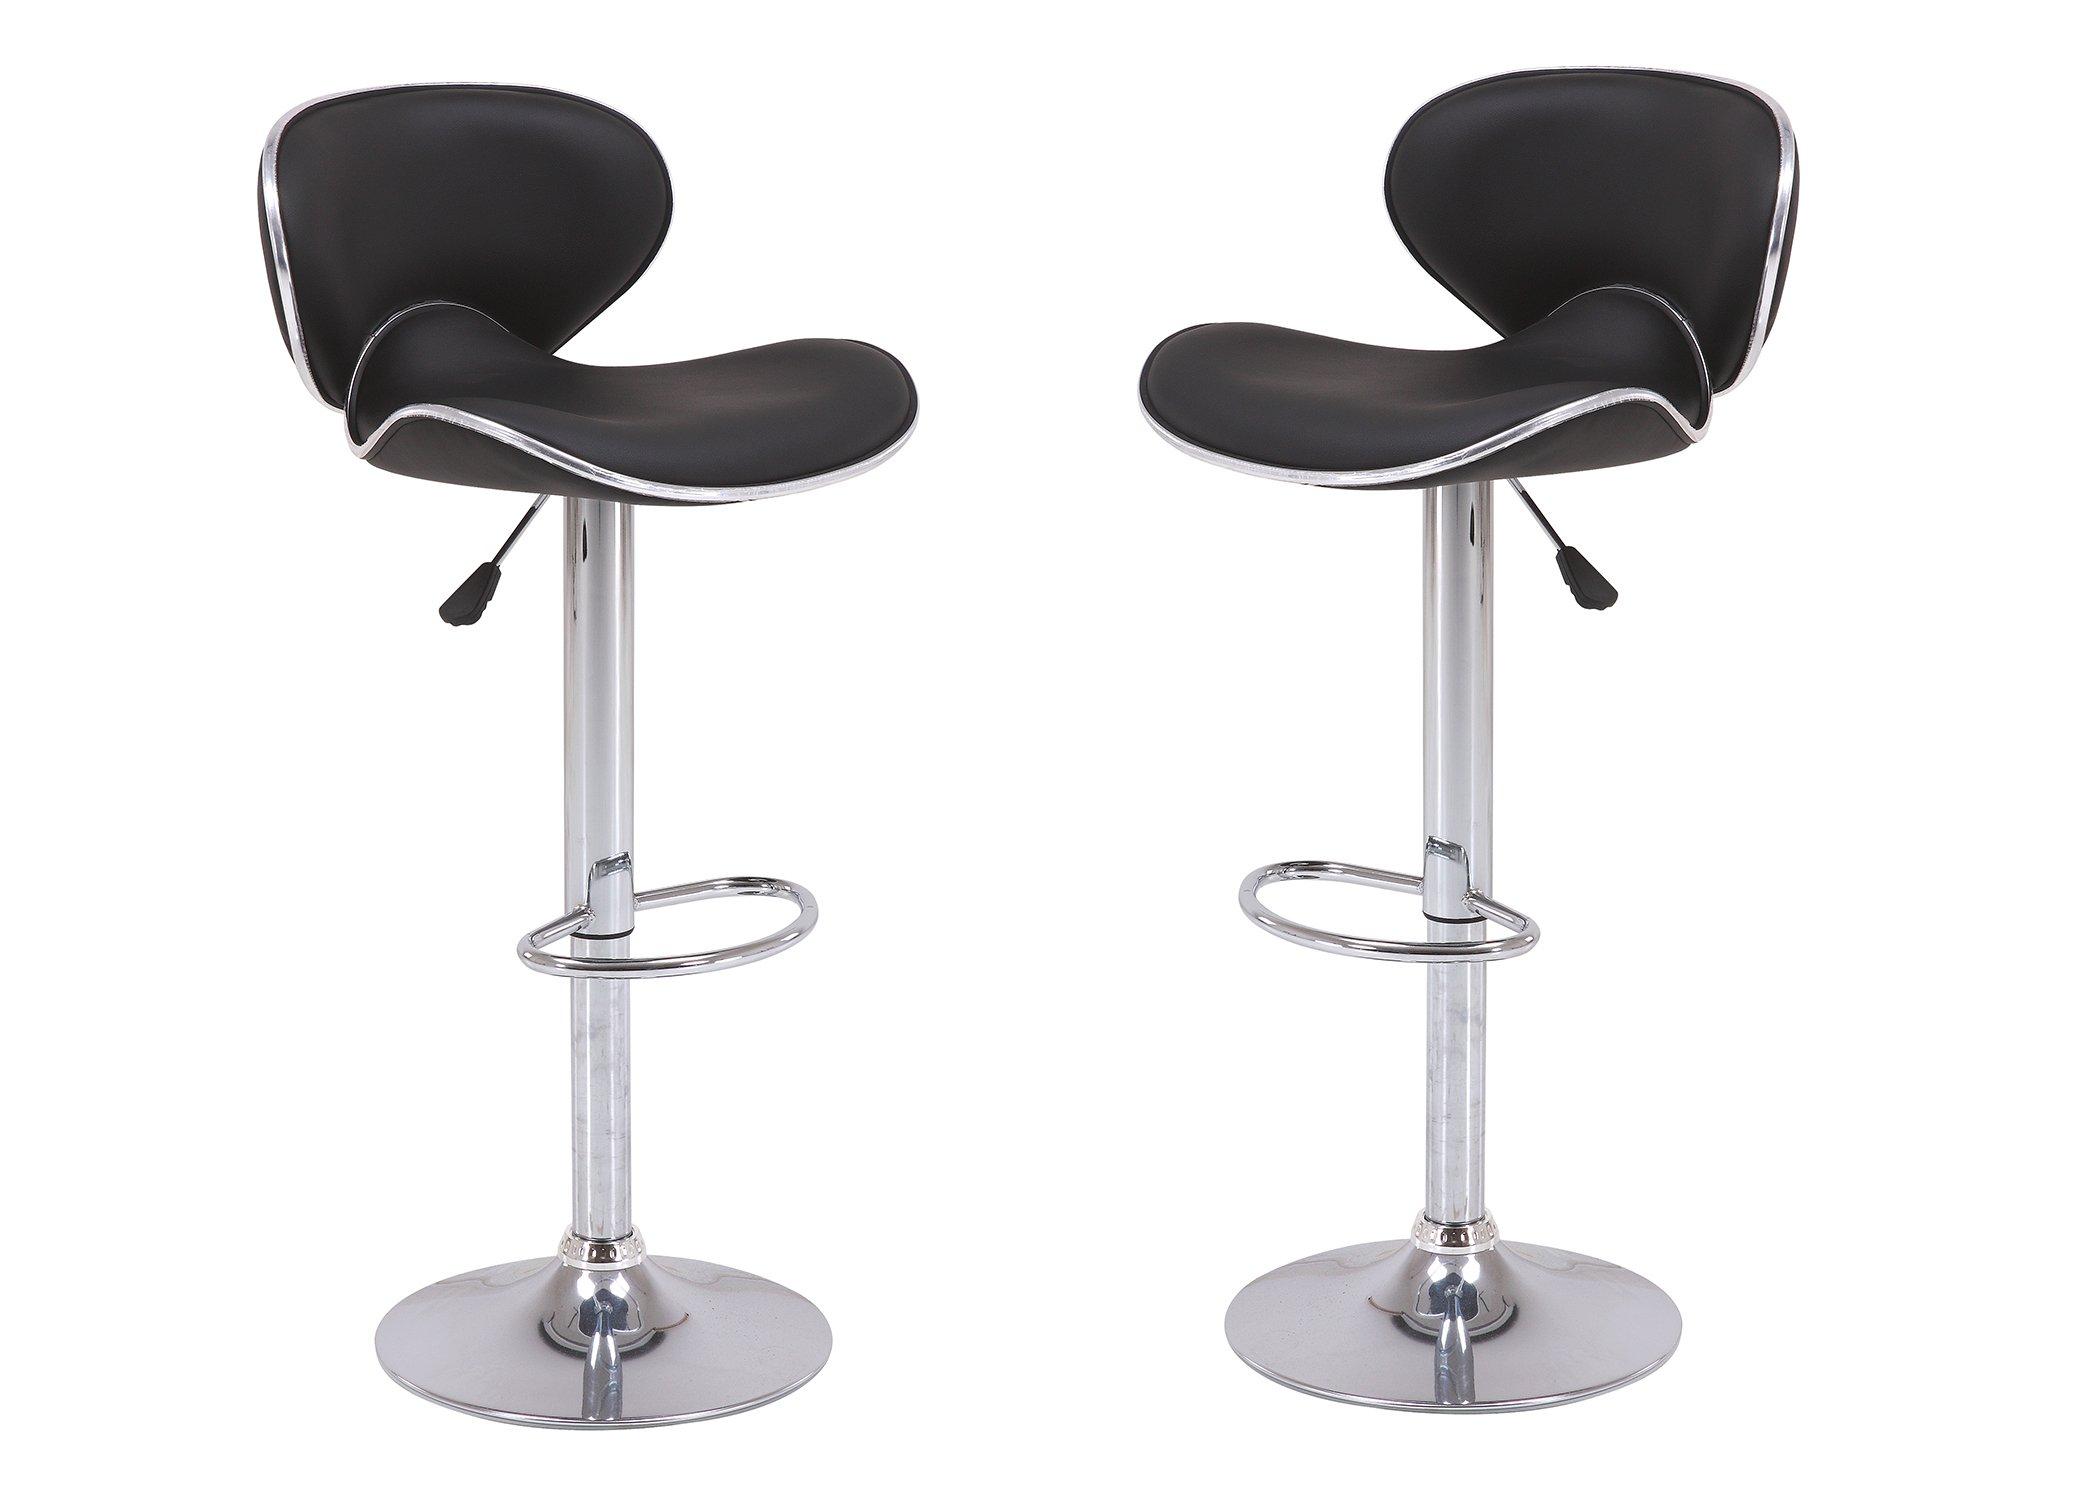 Vogue Furniture Direct Adjustable Height Swivel Barstools with Footrest, Black (Set of 2) VF1581046-2